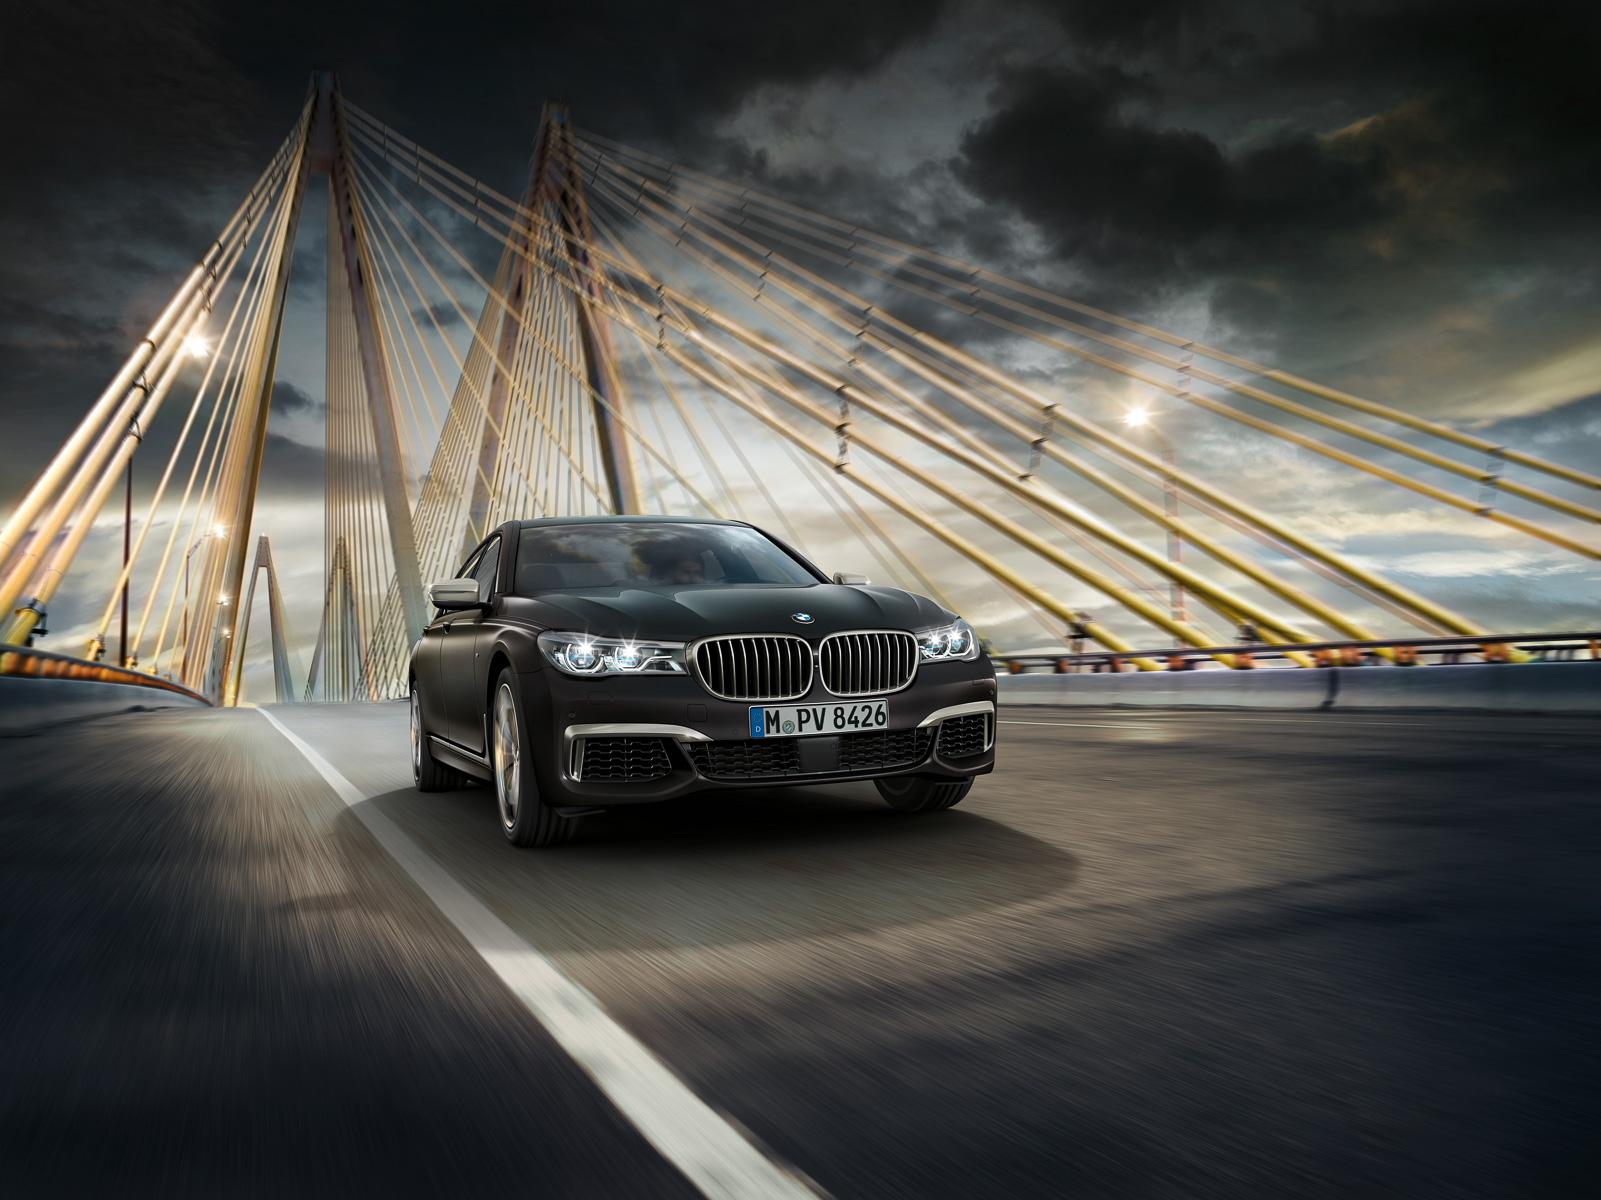 Photographer Erik Chmil for BMW